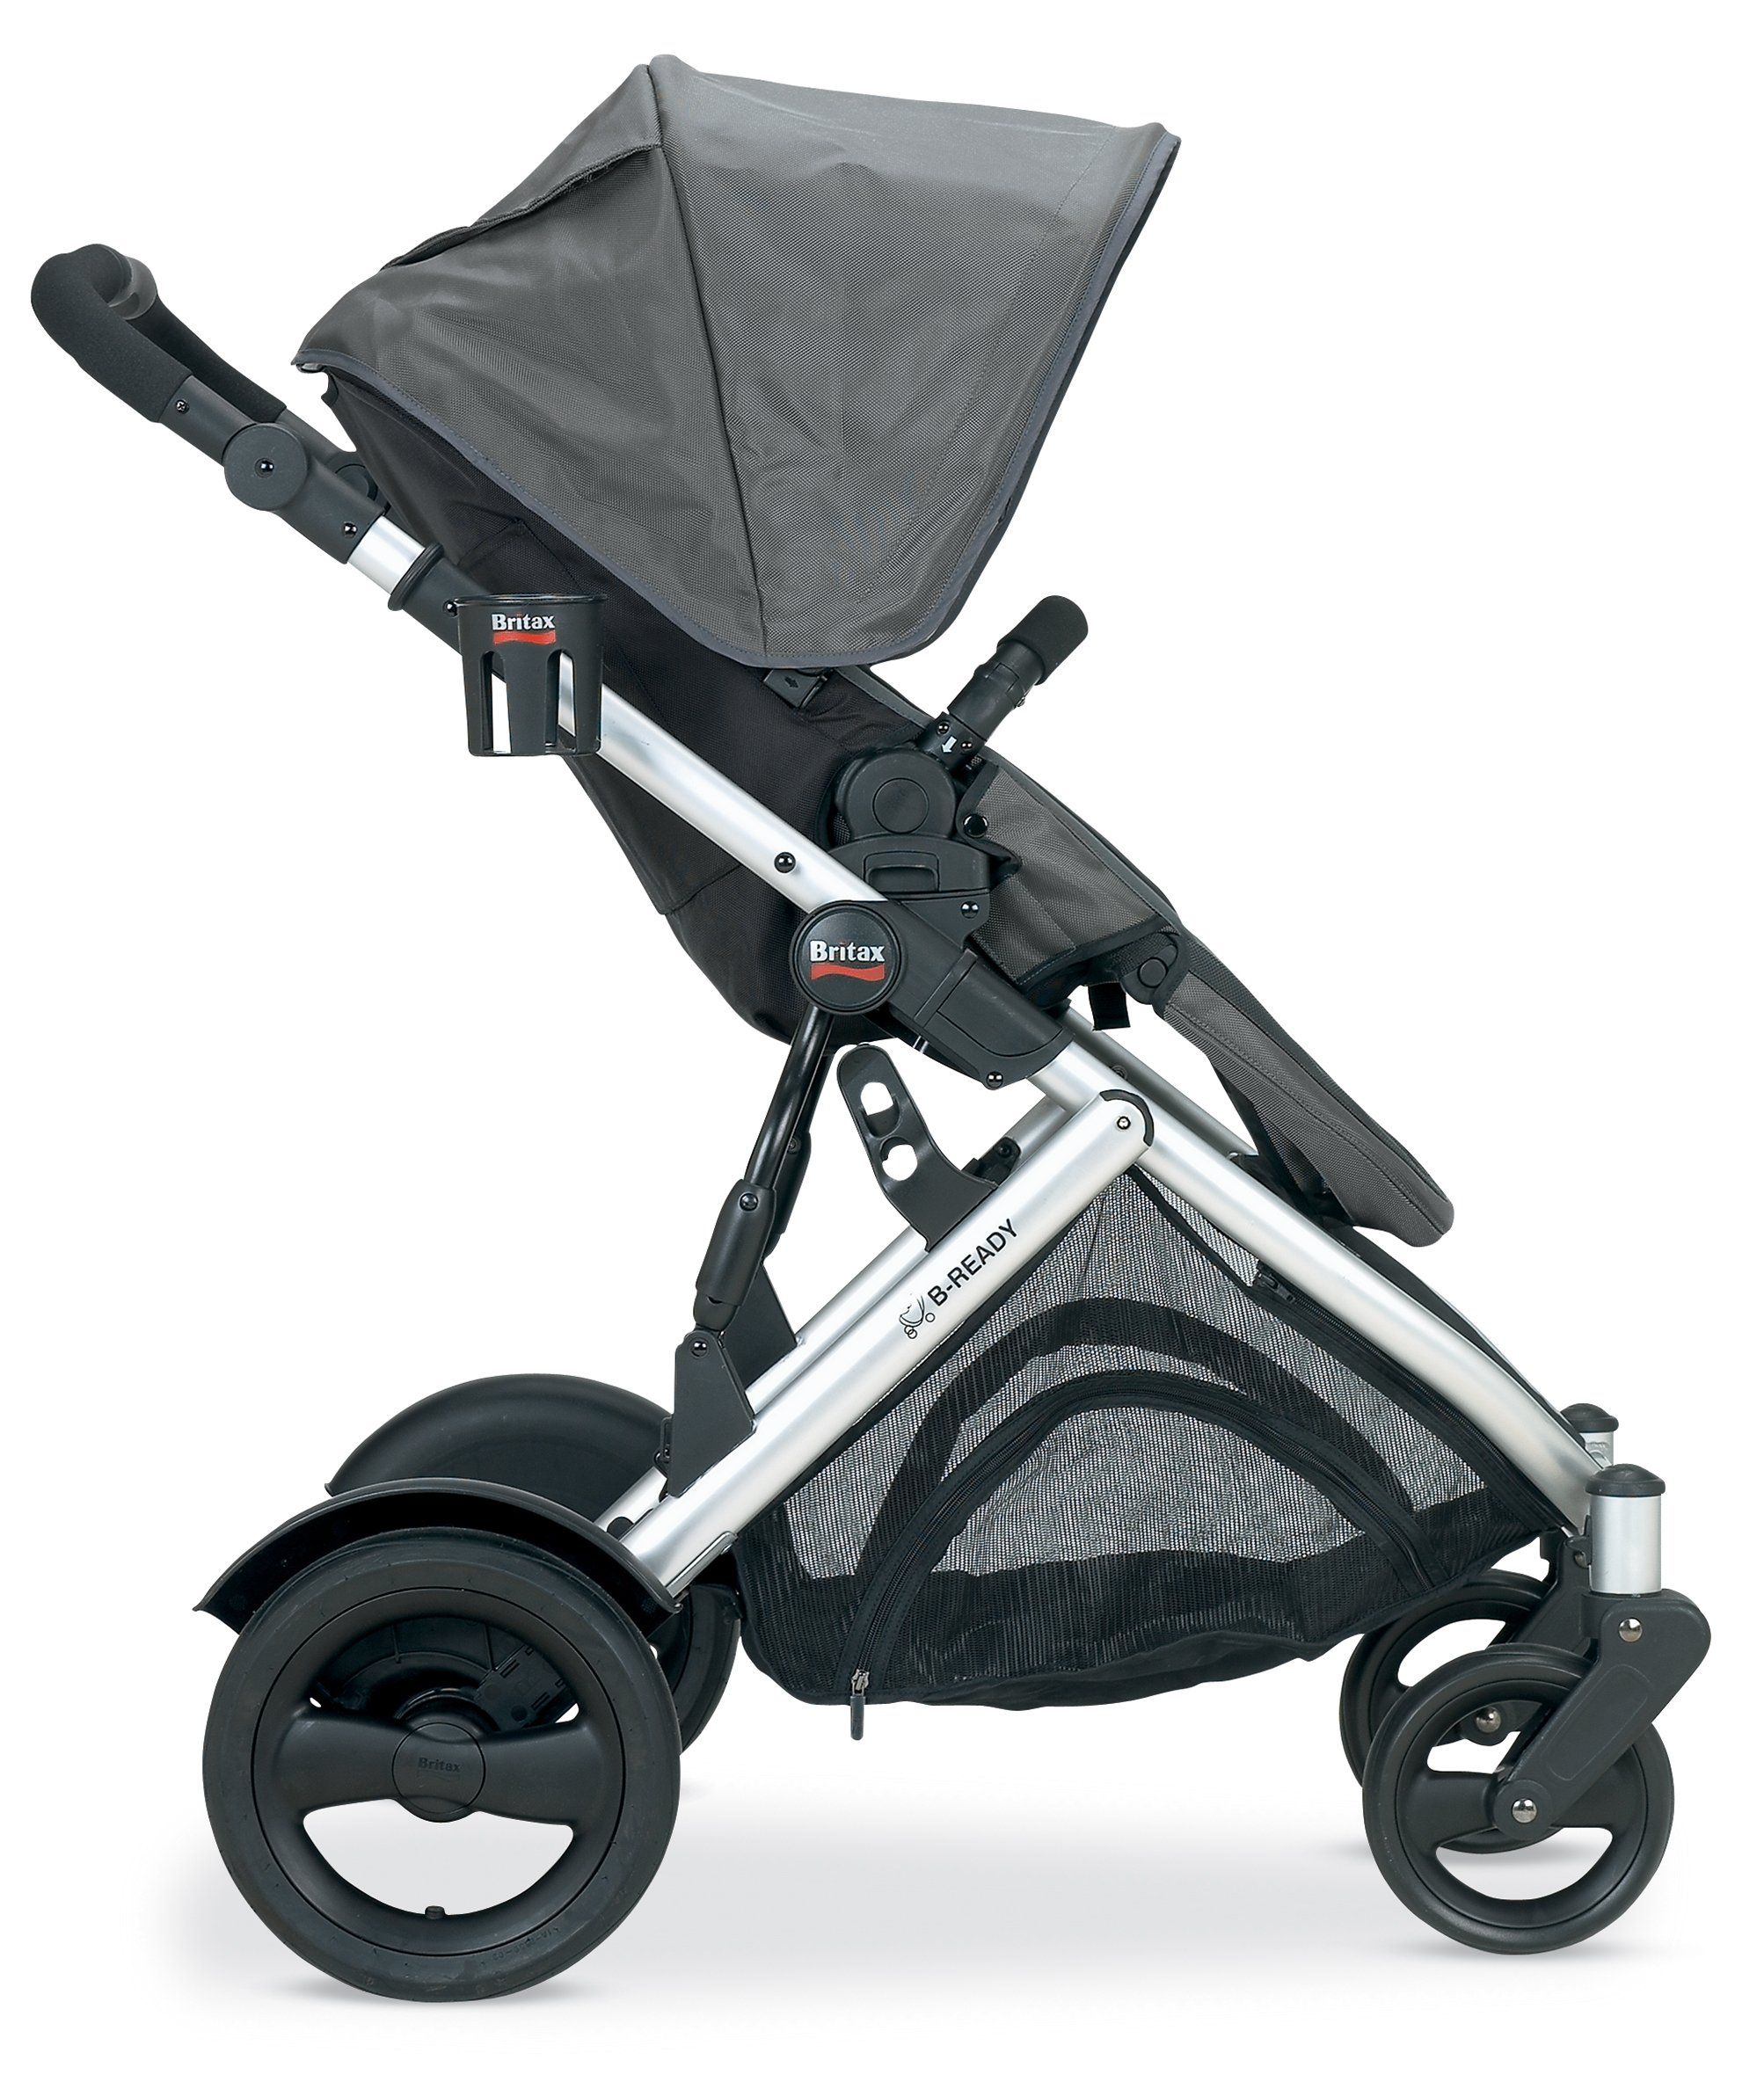 Robot Check Best baby strollers, Britax b ready stroller